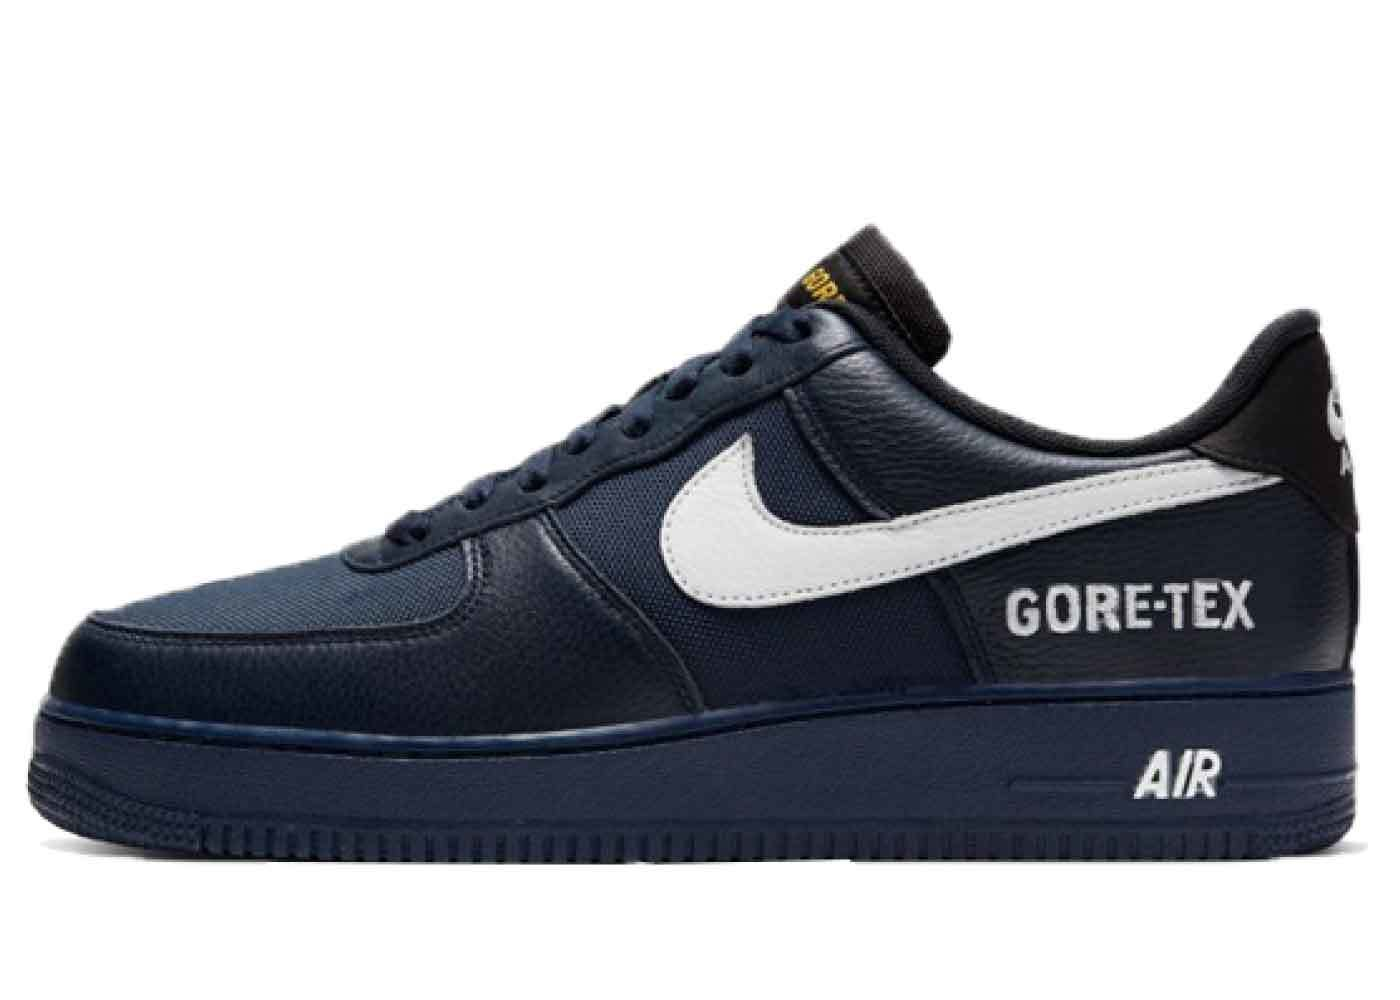 Nike Air Force 1 Low Gore-tex Obsidianの写真